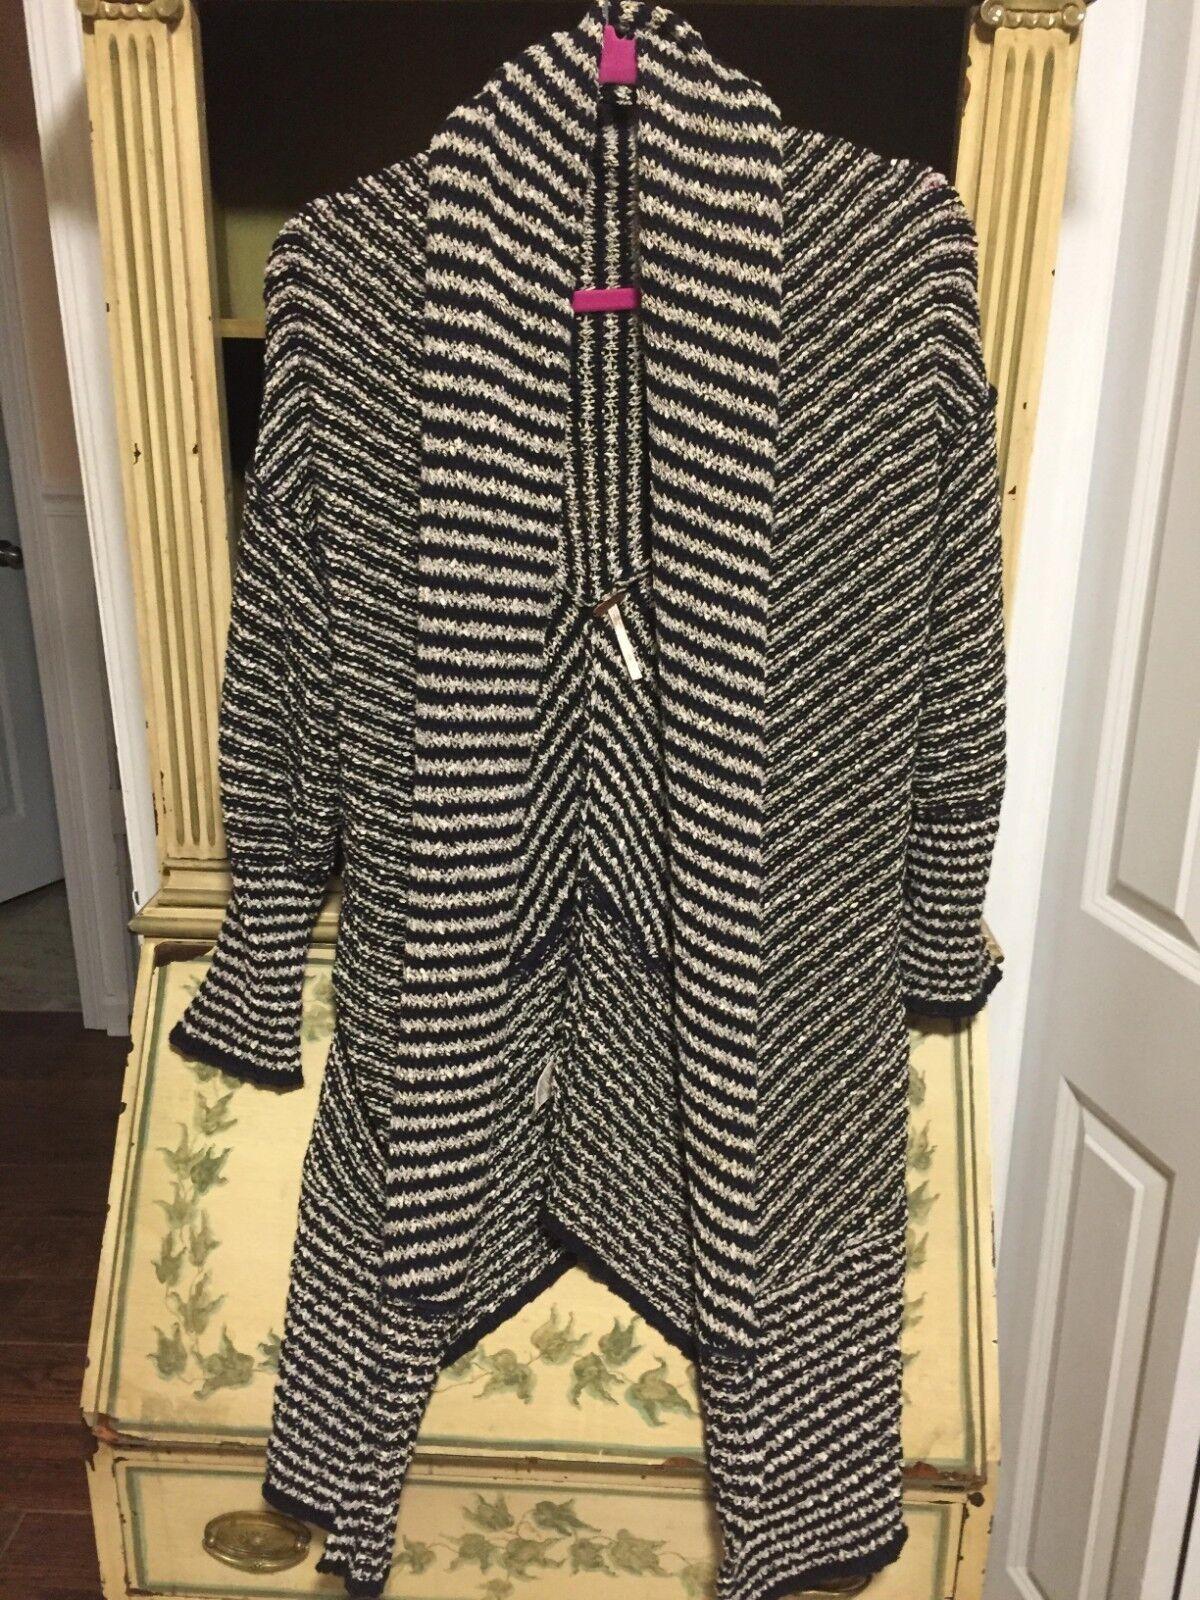 SALEFree People Sweater KNIT KNIT KNIT Cardigan stripe navy Shawl Collar TUNIC 3 4 sleeve a417e6